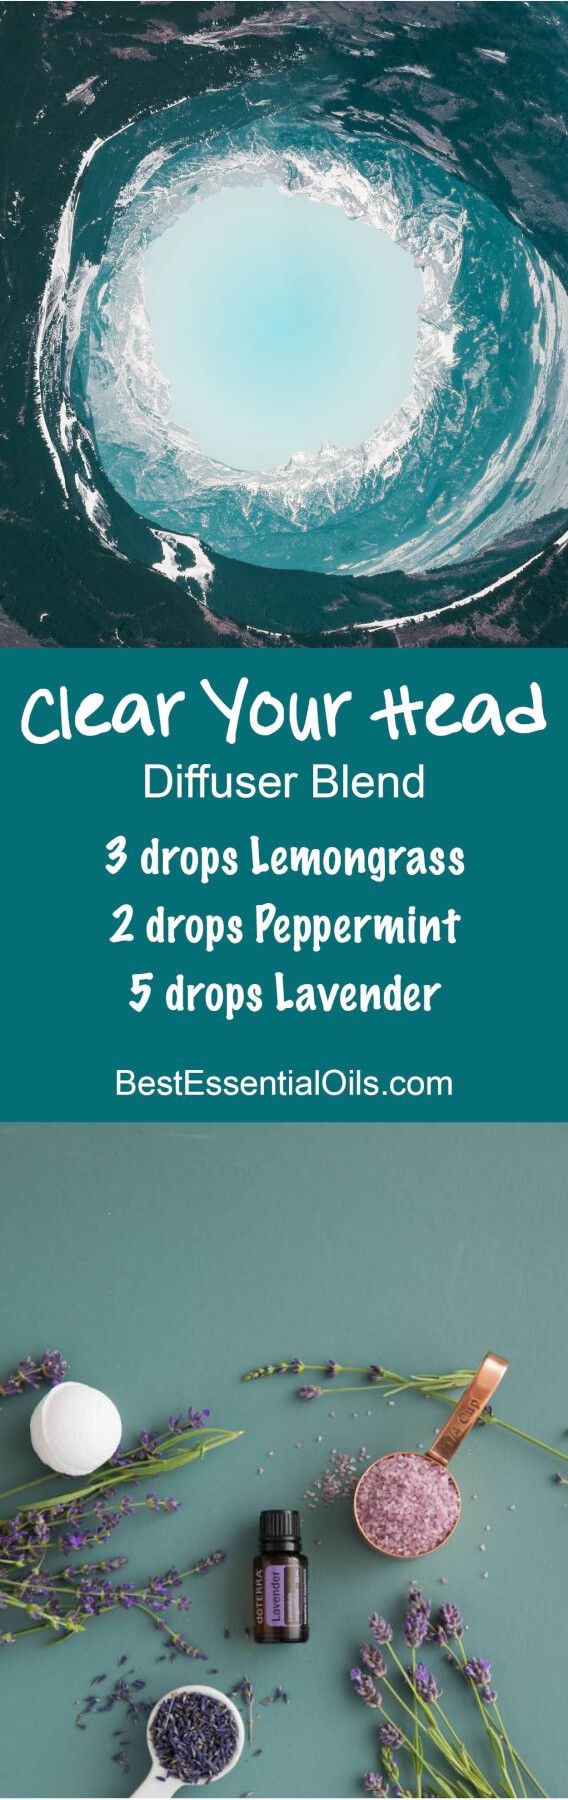 9e98dd2ff0cb7a0f31f077ed35b4811f Clear Your Head Essential Oils Diffuser Blend ••• Buy dōTERRA essential o...